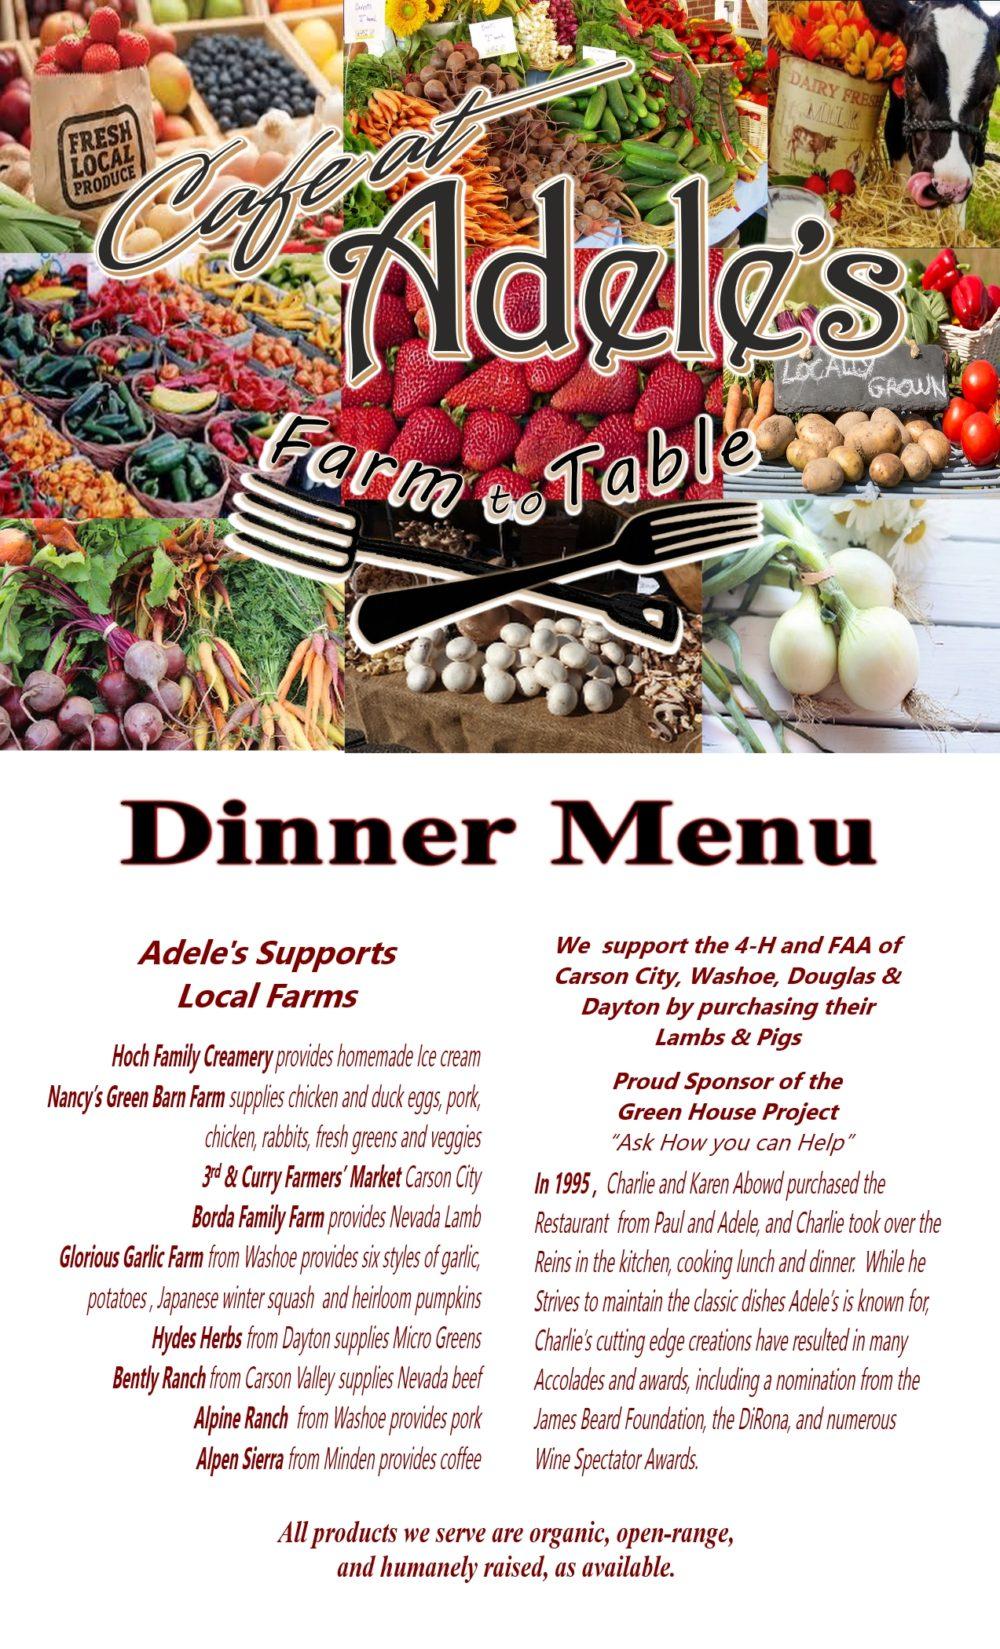 New Dinner Menu Cover 8-2017